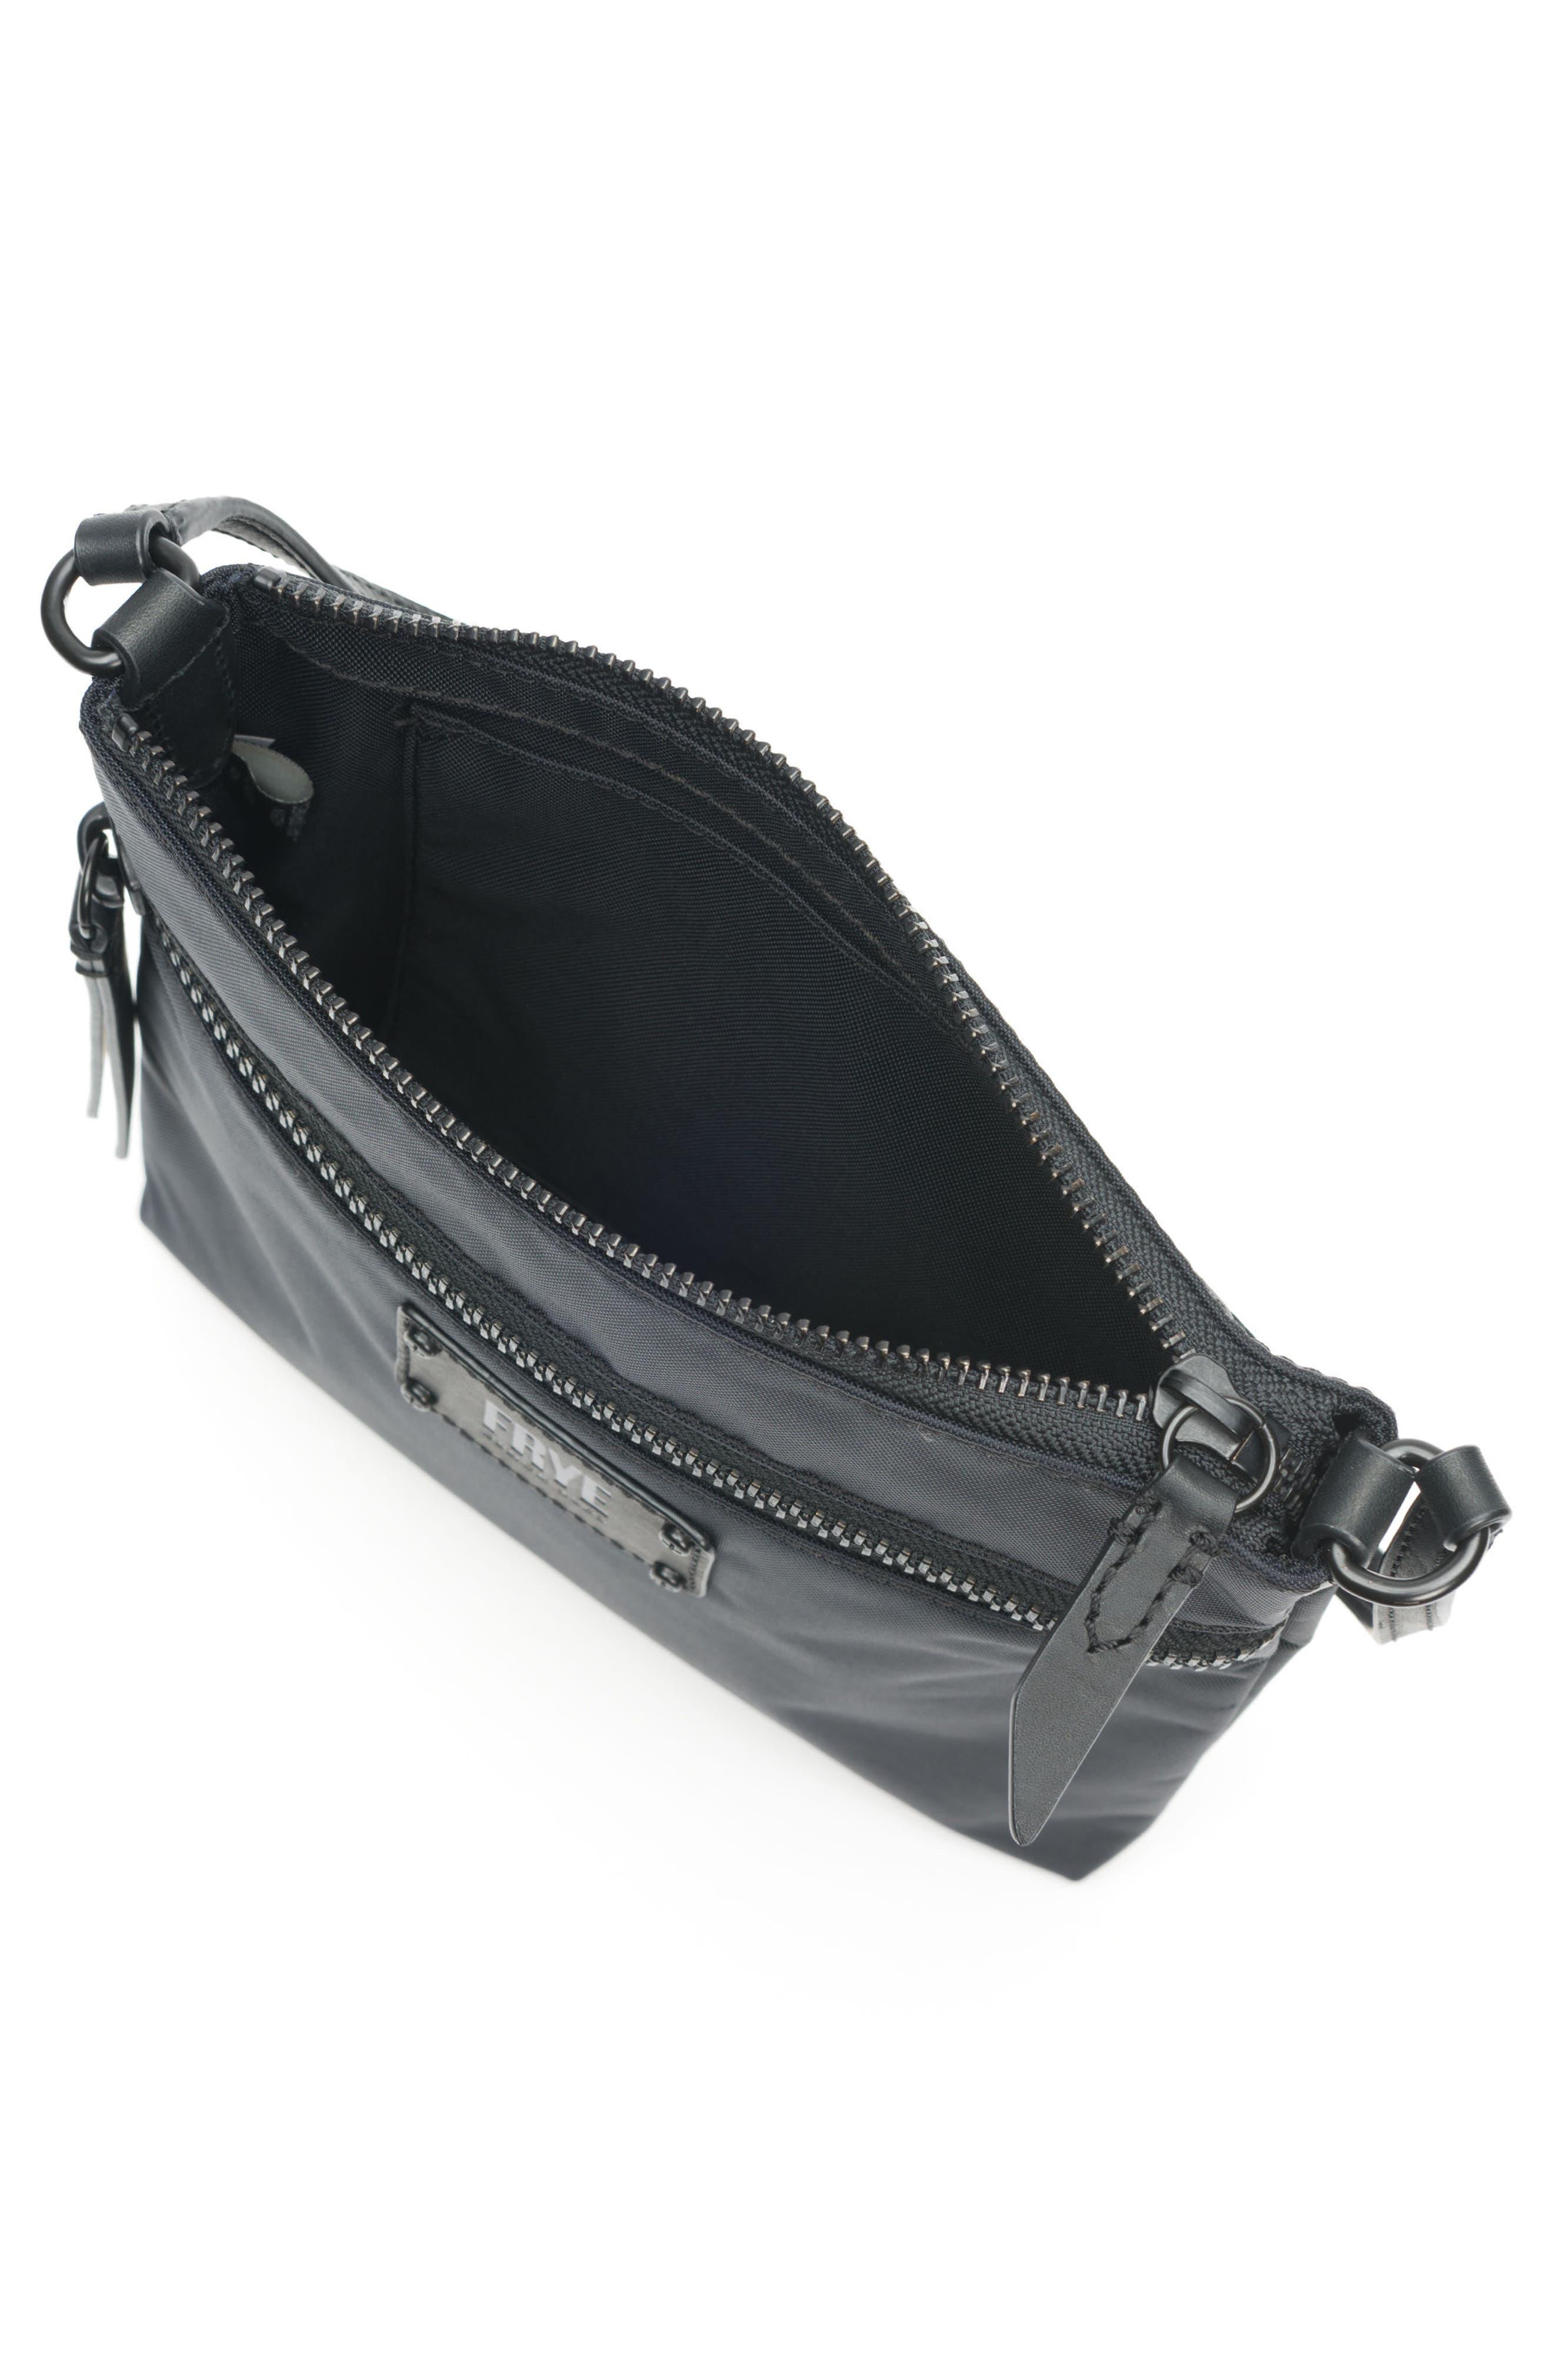 Ivy Nylon Crossbody Bag,                             Alternate thumbnail 4, color,                             MATTE BLACK